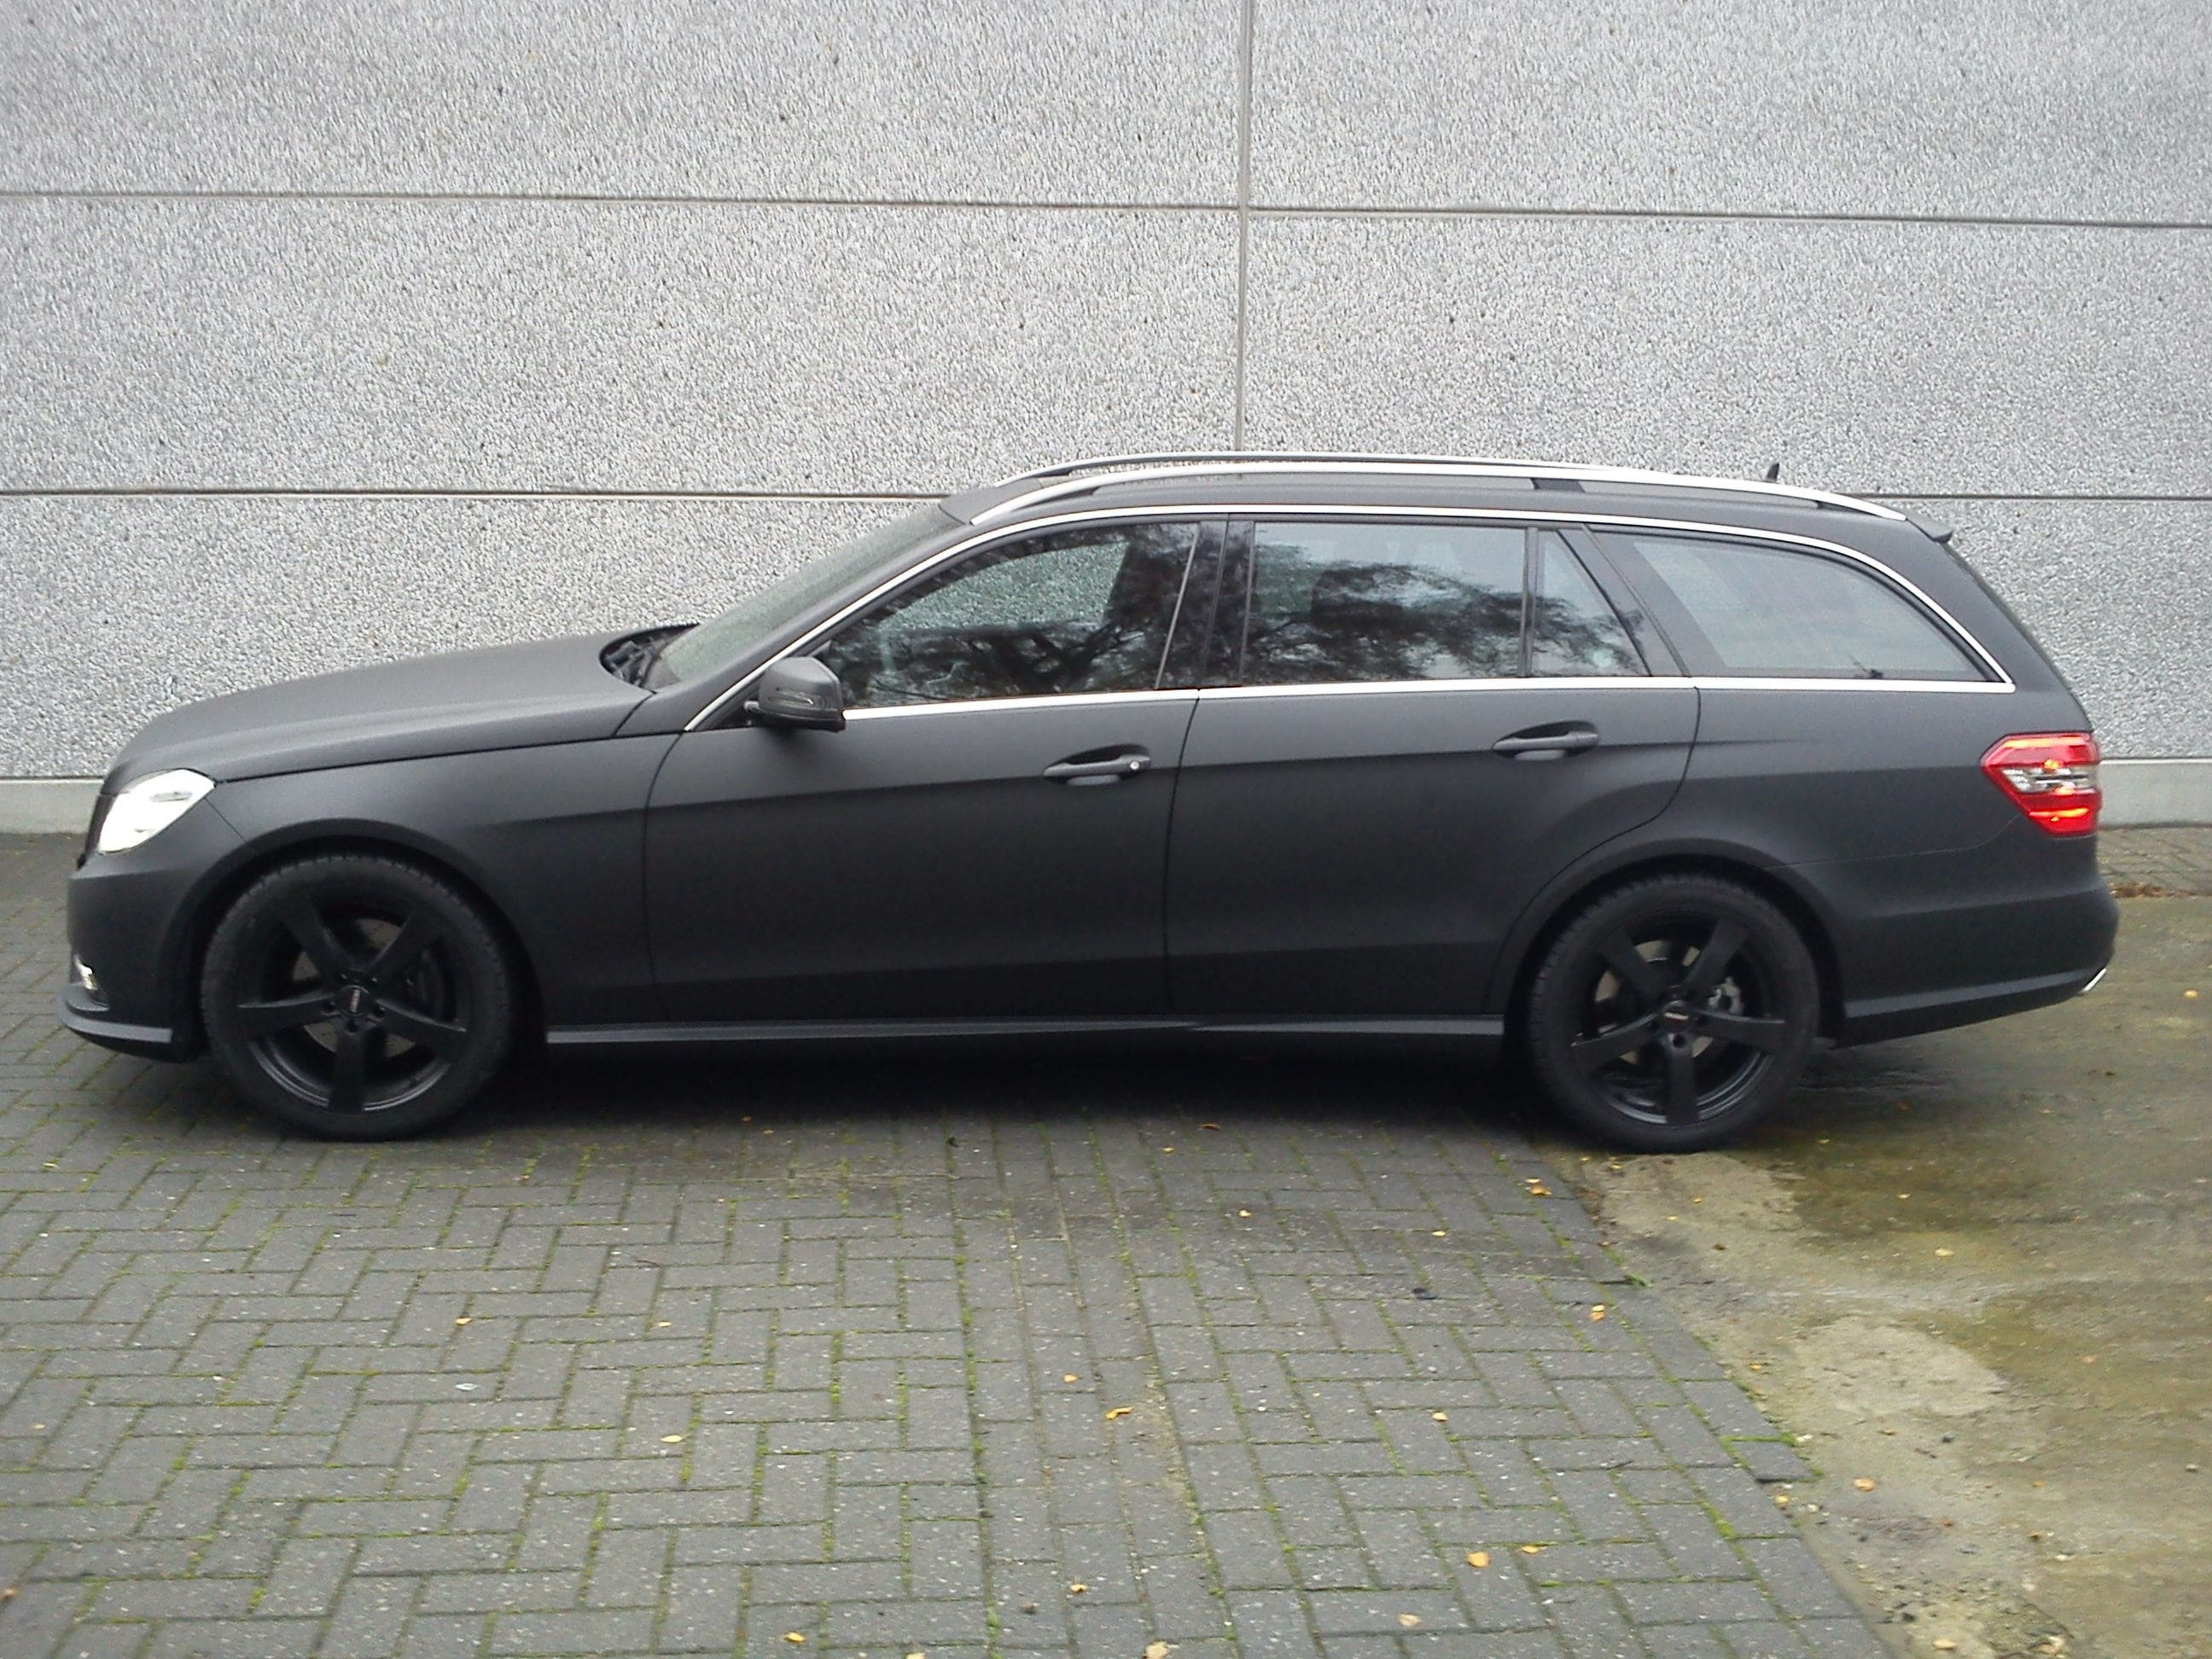 Mercedes E320 met Mat Zwarte Wrap, Carwrapping door Wrapmyride.nu Foto-nr:6229, ©2021